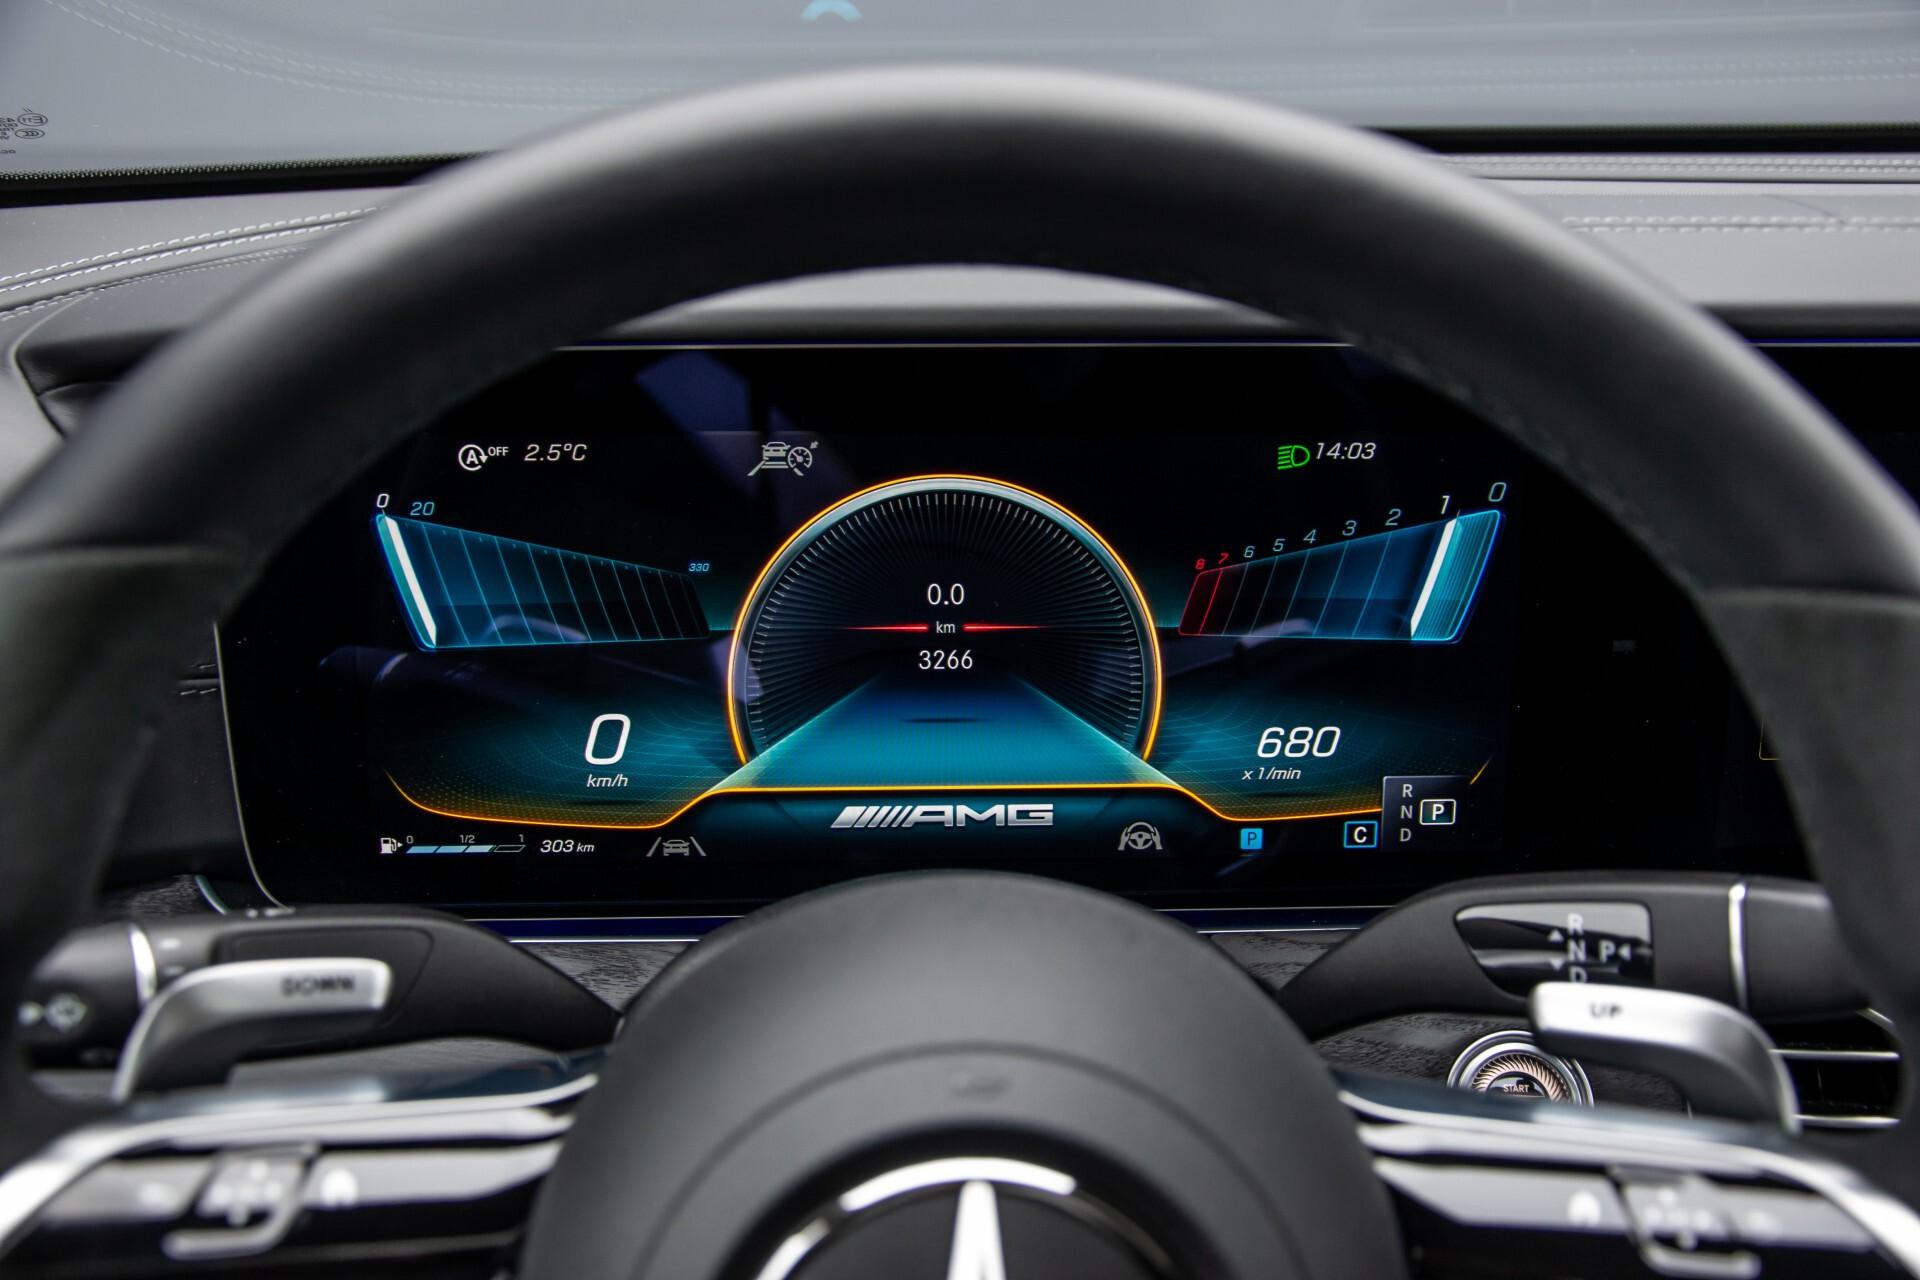 Mercedes-Benz E-Klasse 63 S AMG 4M+ NIEUW MODEL Night/Massage/Rij-assist/Keyless/Hud Aut9 Foto 10